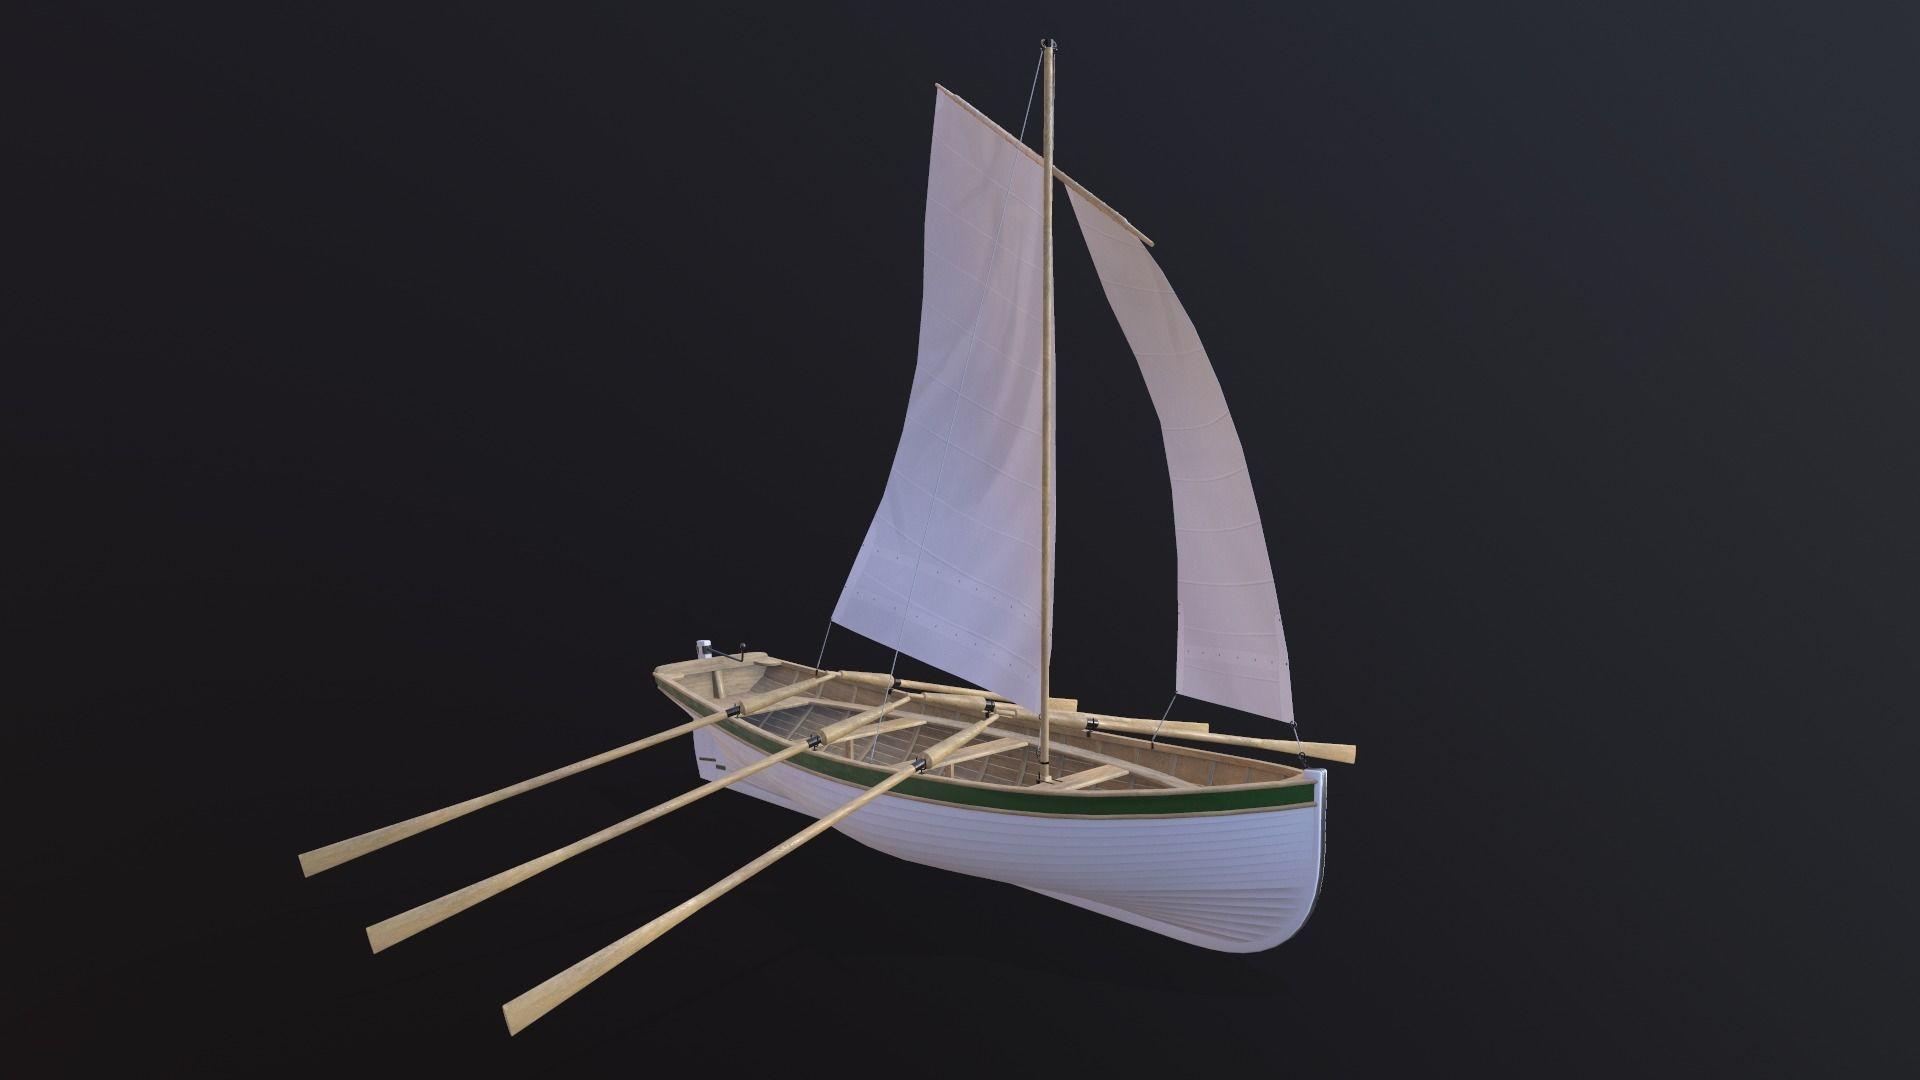 Wooden boat Yal-6